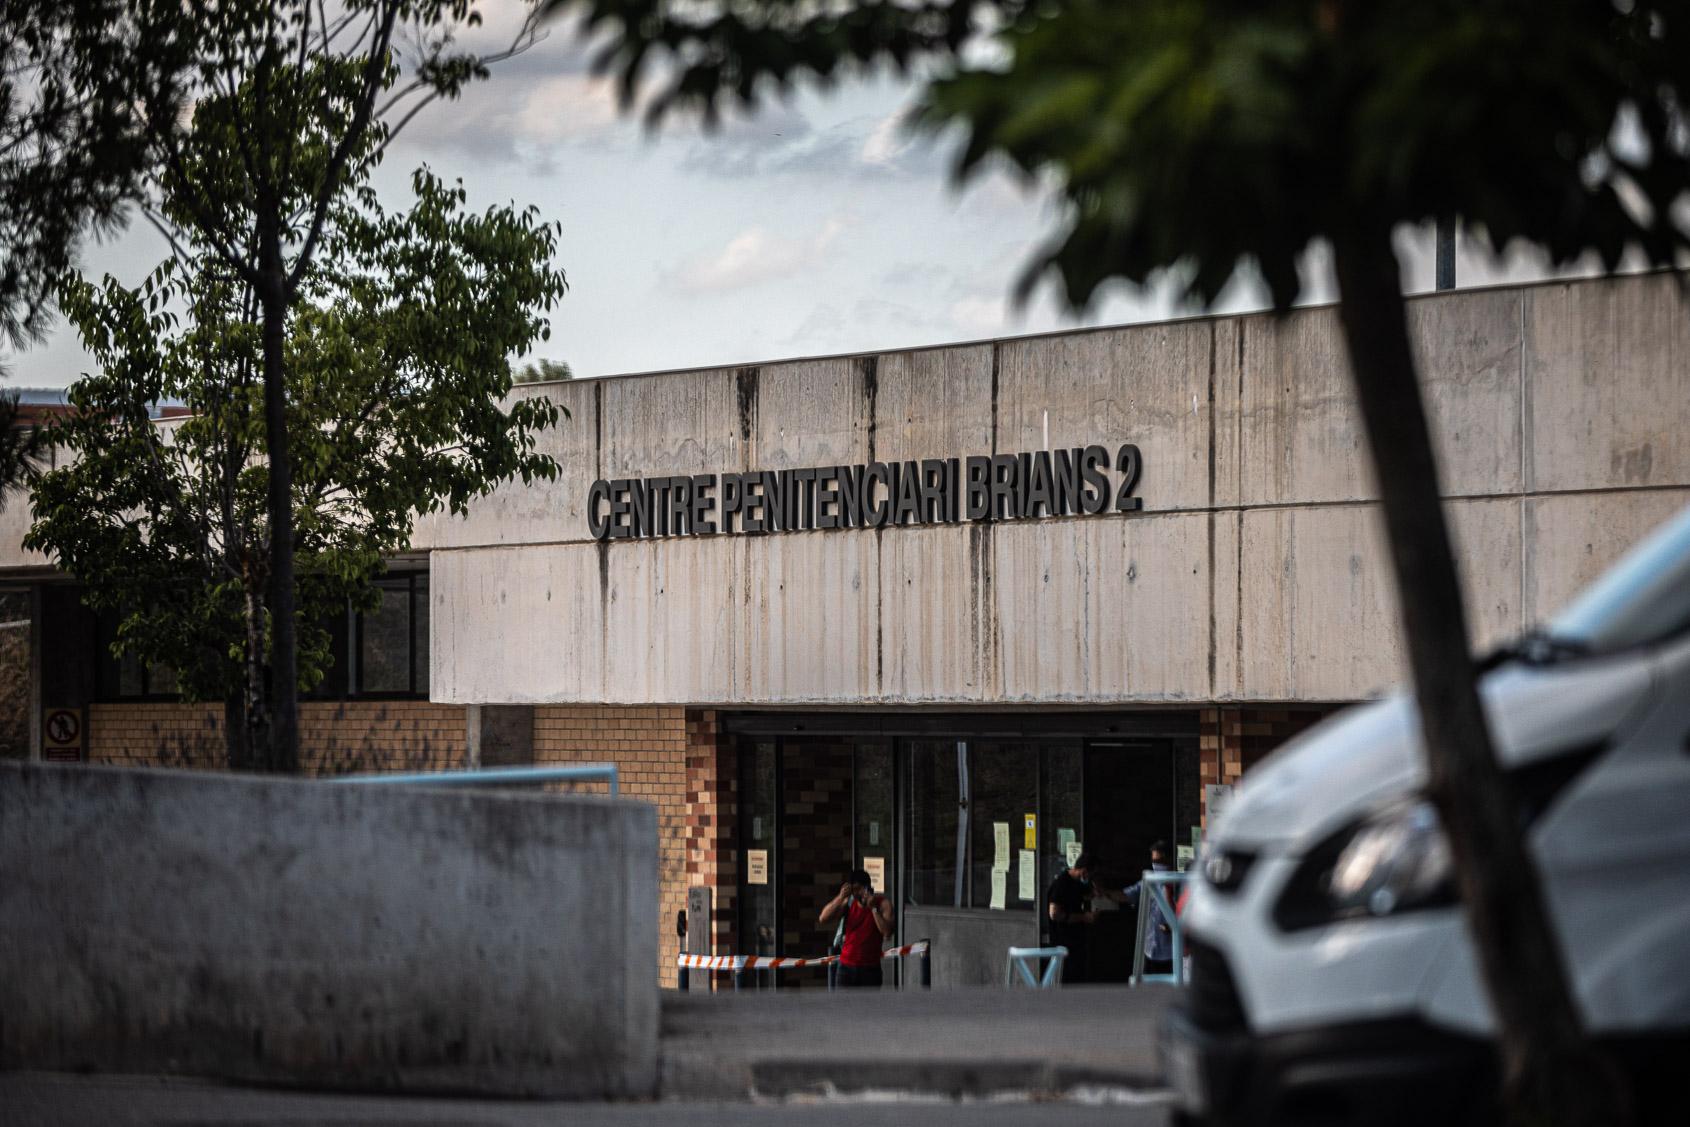 Entrada de la presó de Brians 2 / Jordi Borràs